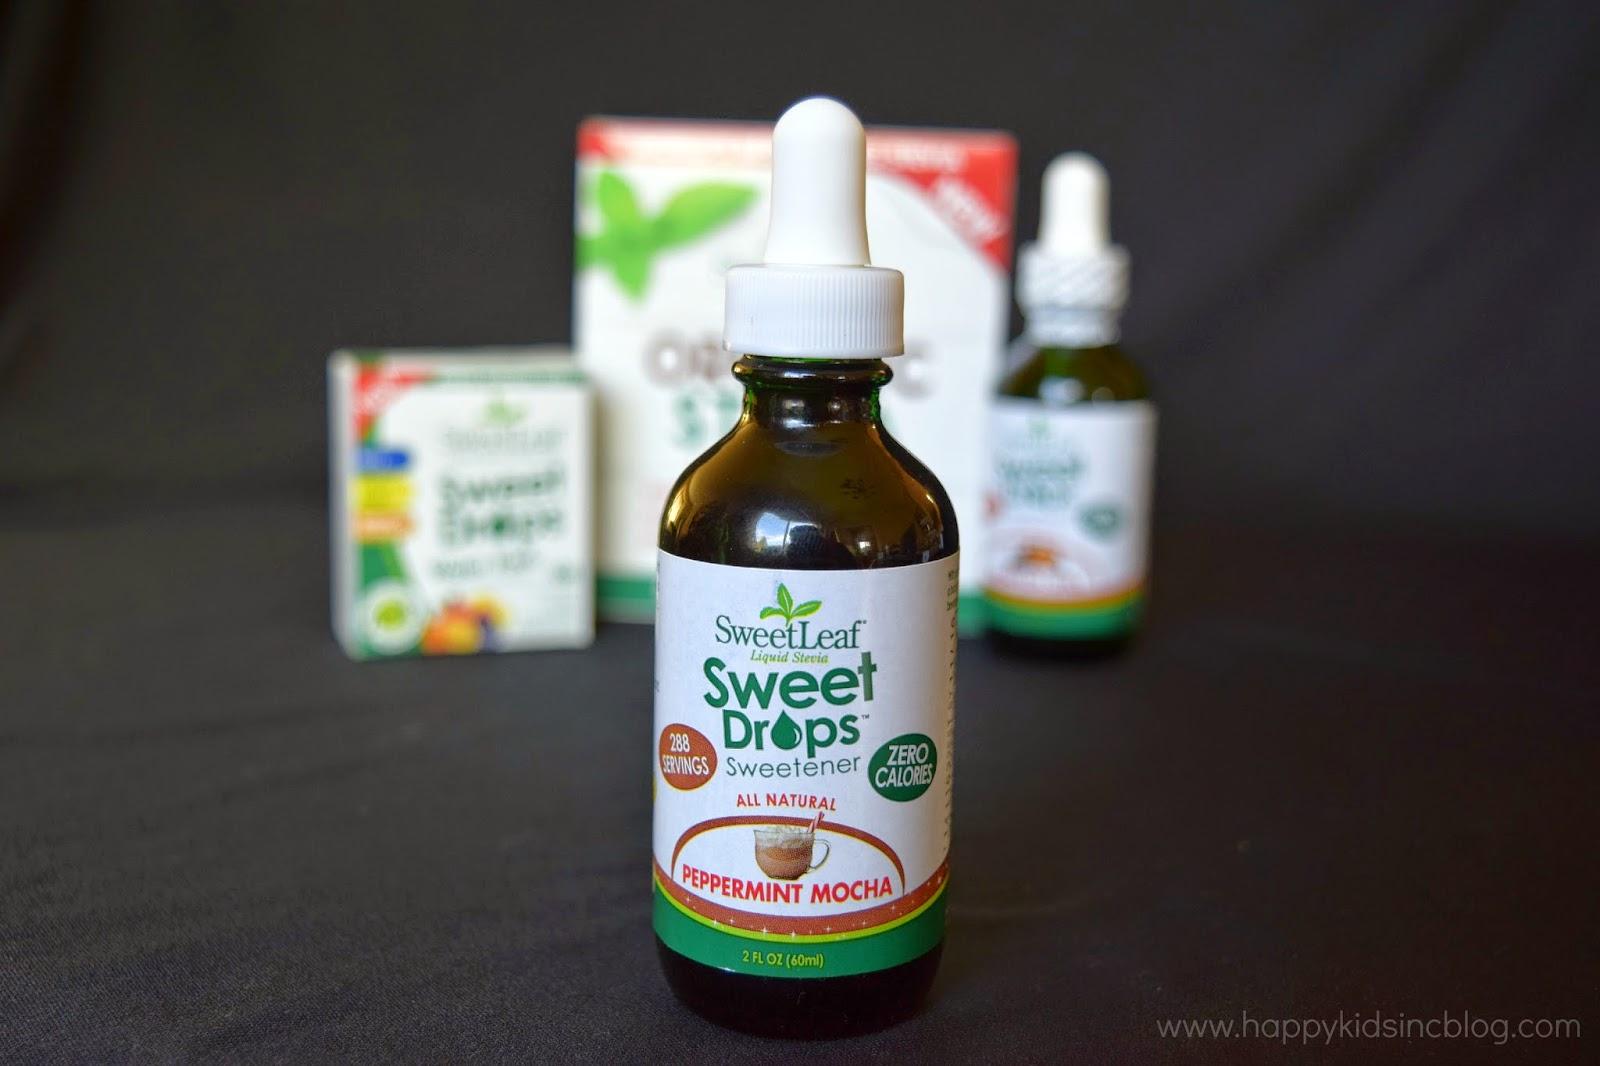 Enjoy sugar free beverages with SweetLeaf Organic Stevia Sweet Drops